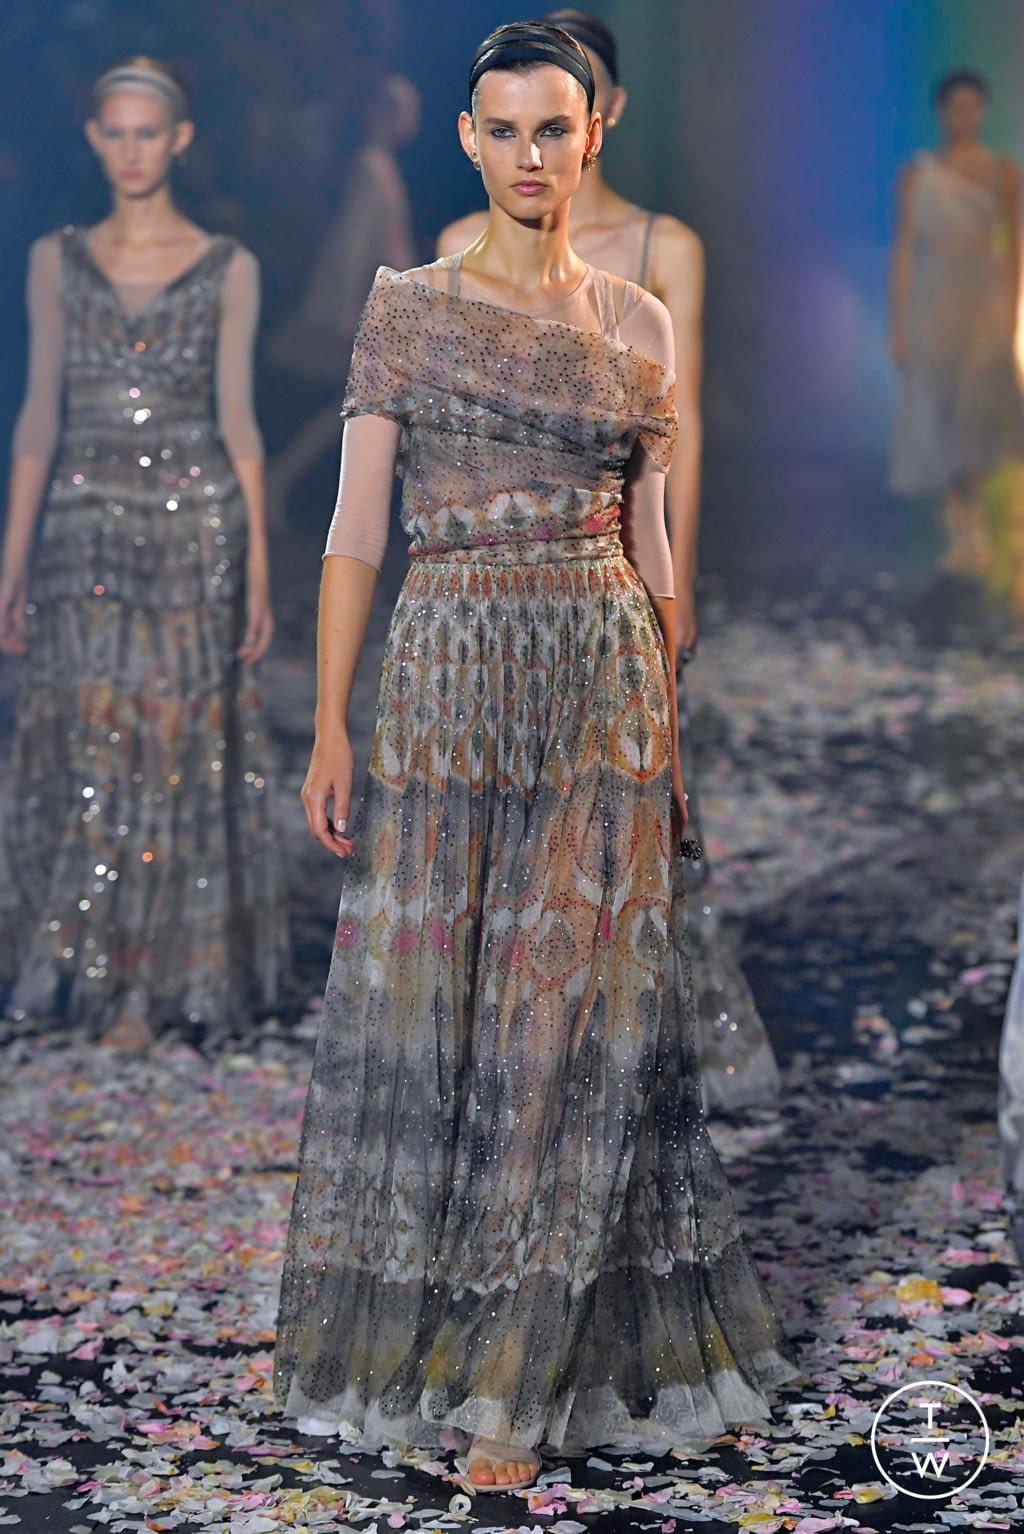 Dungarees Short Mini Jupes Combi harem pant sangle robe longue ethnique S19